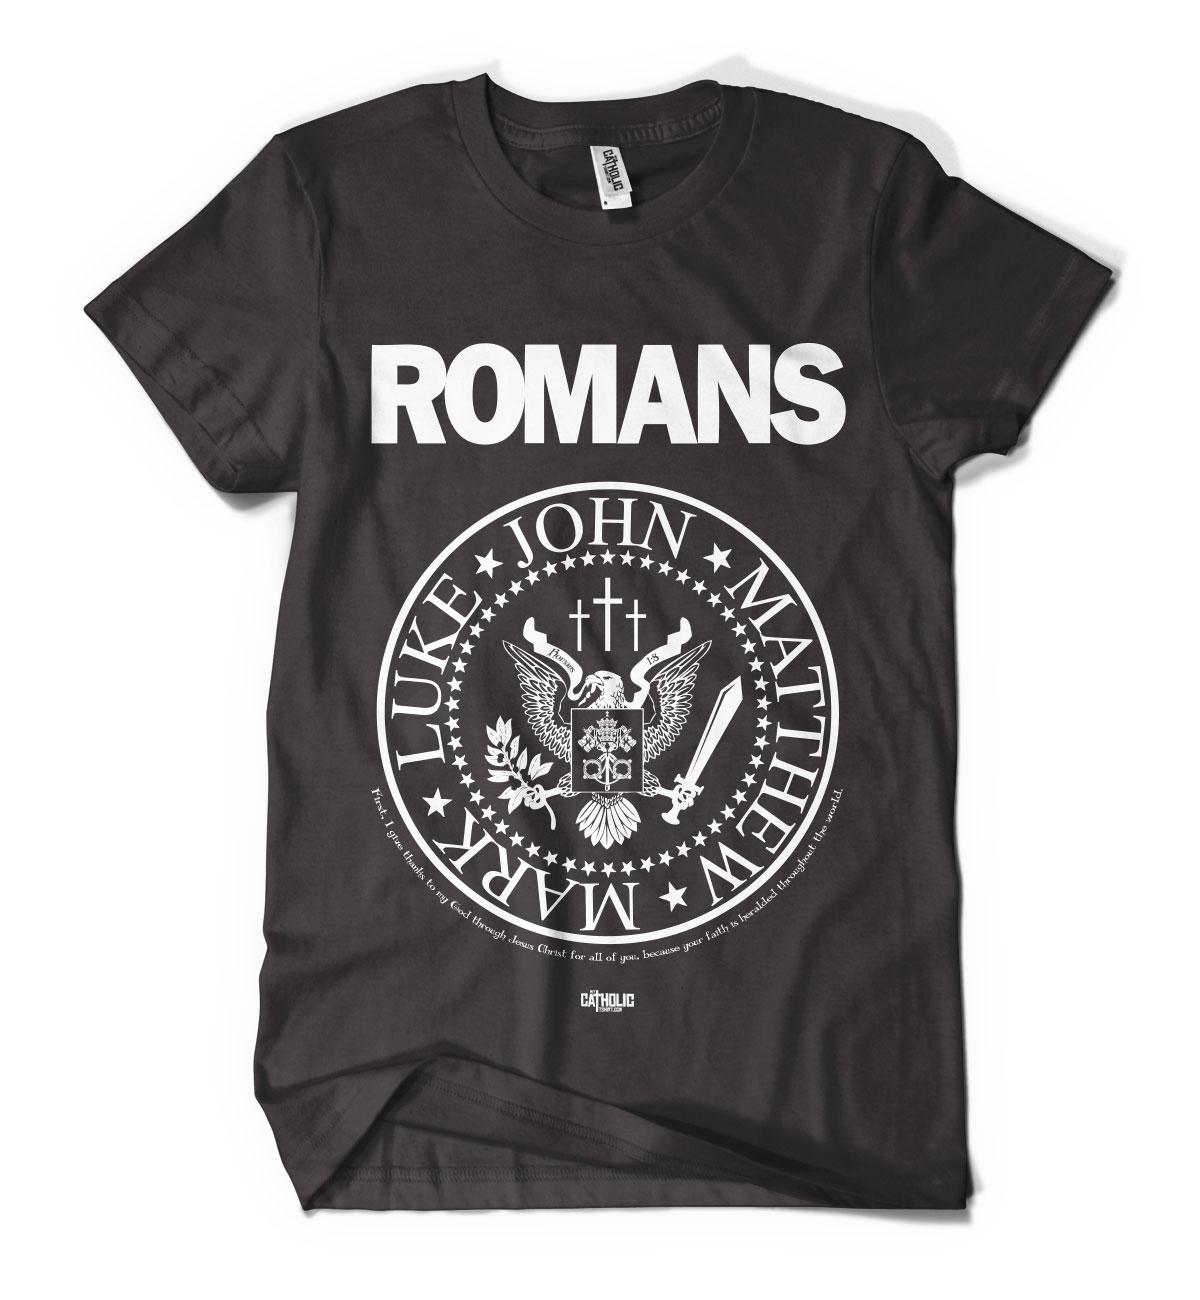 Romans 1:8 T-shirt - Catholic t-shirts - My Catholic TshirtMy ...